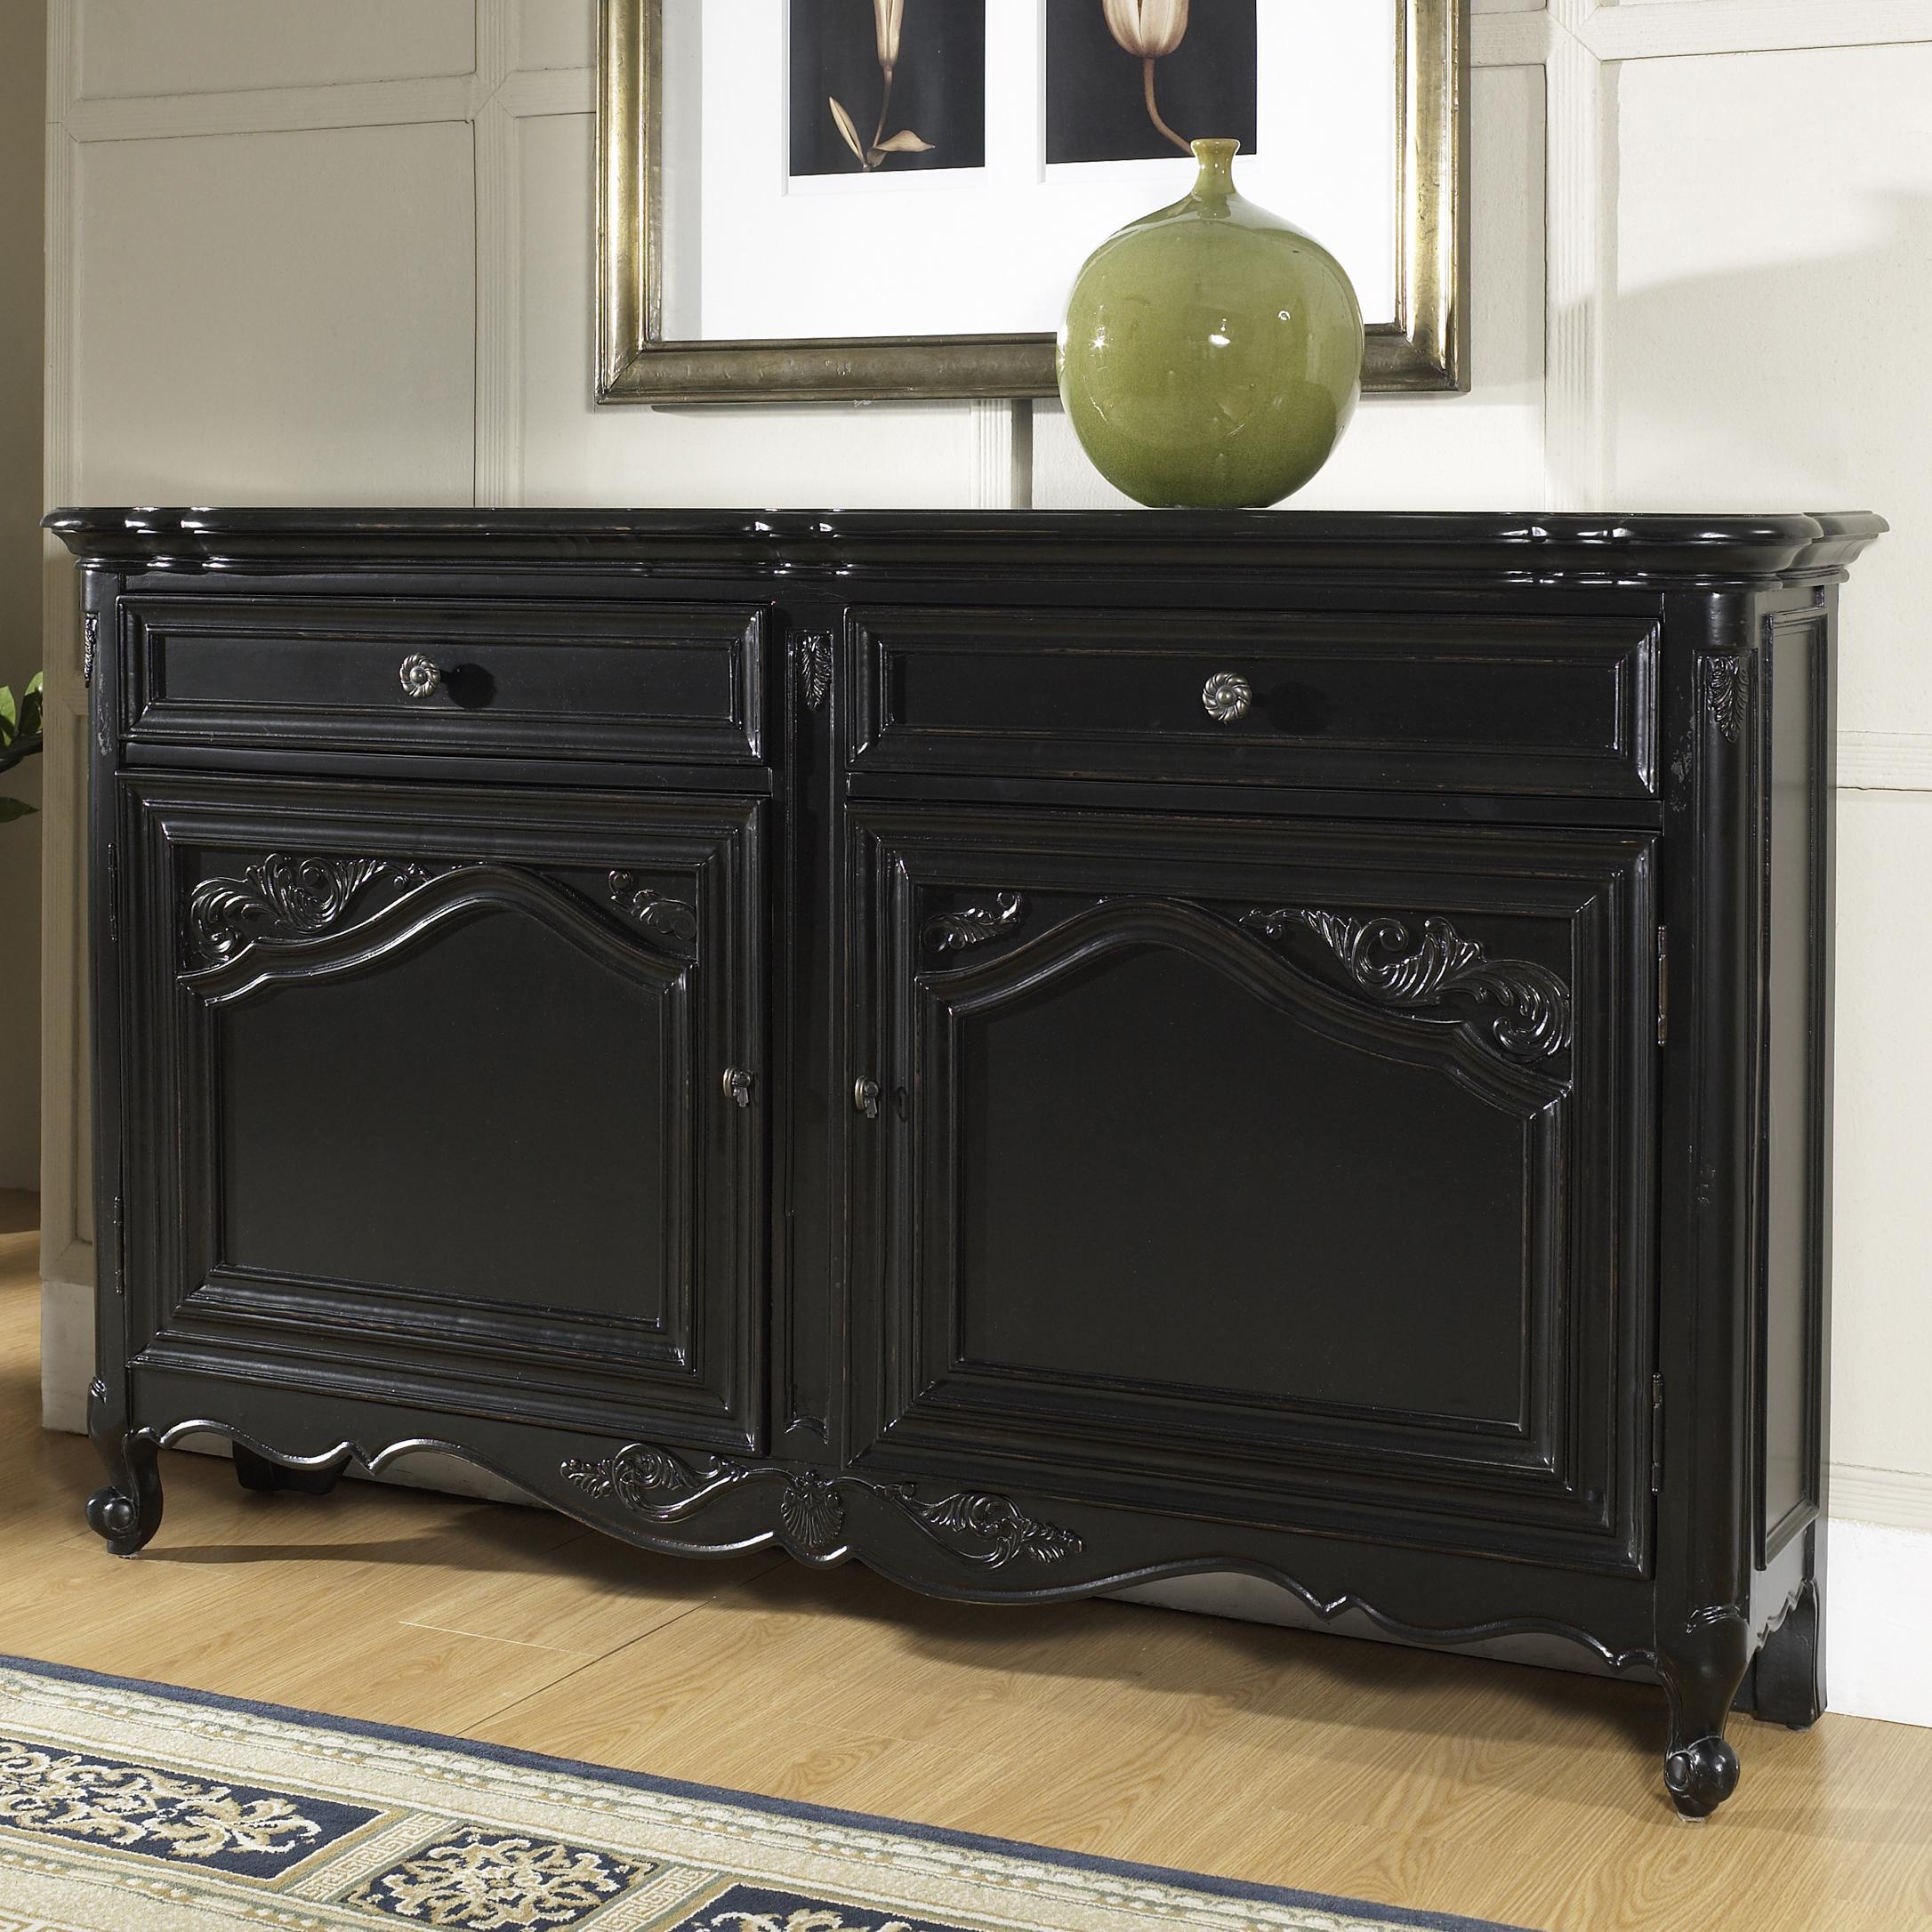 Pulaski furniture accents 917006 hall console table with for Pulaski furniture